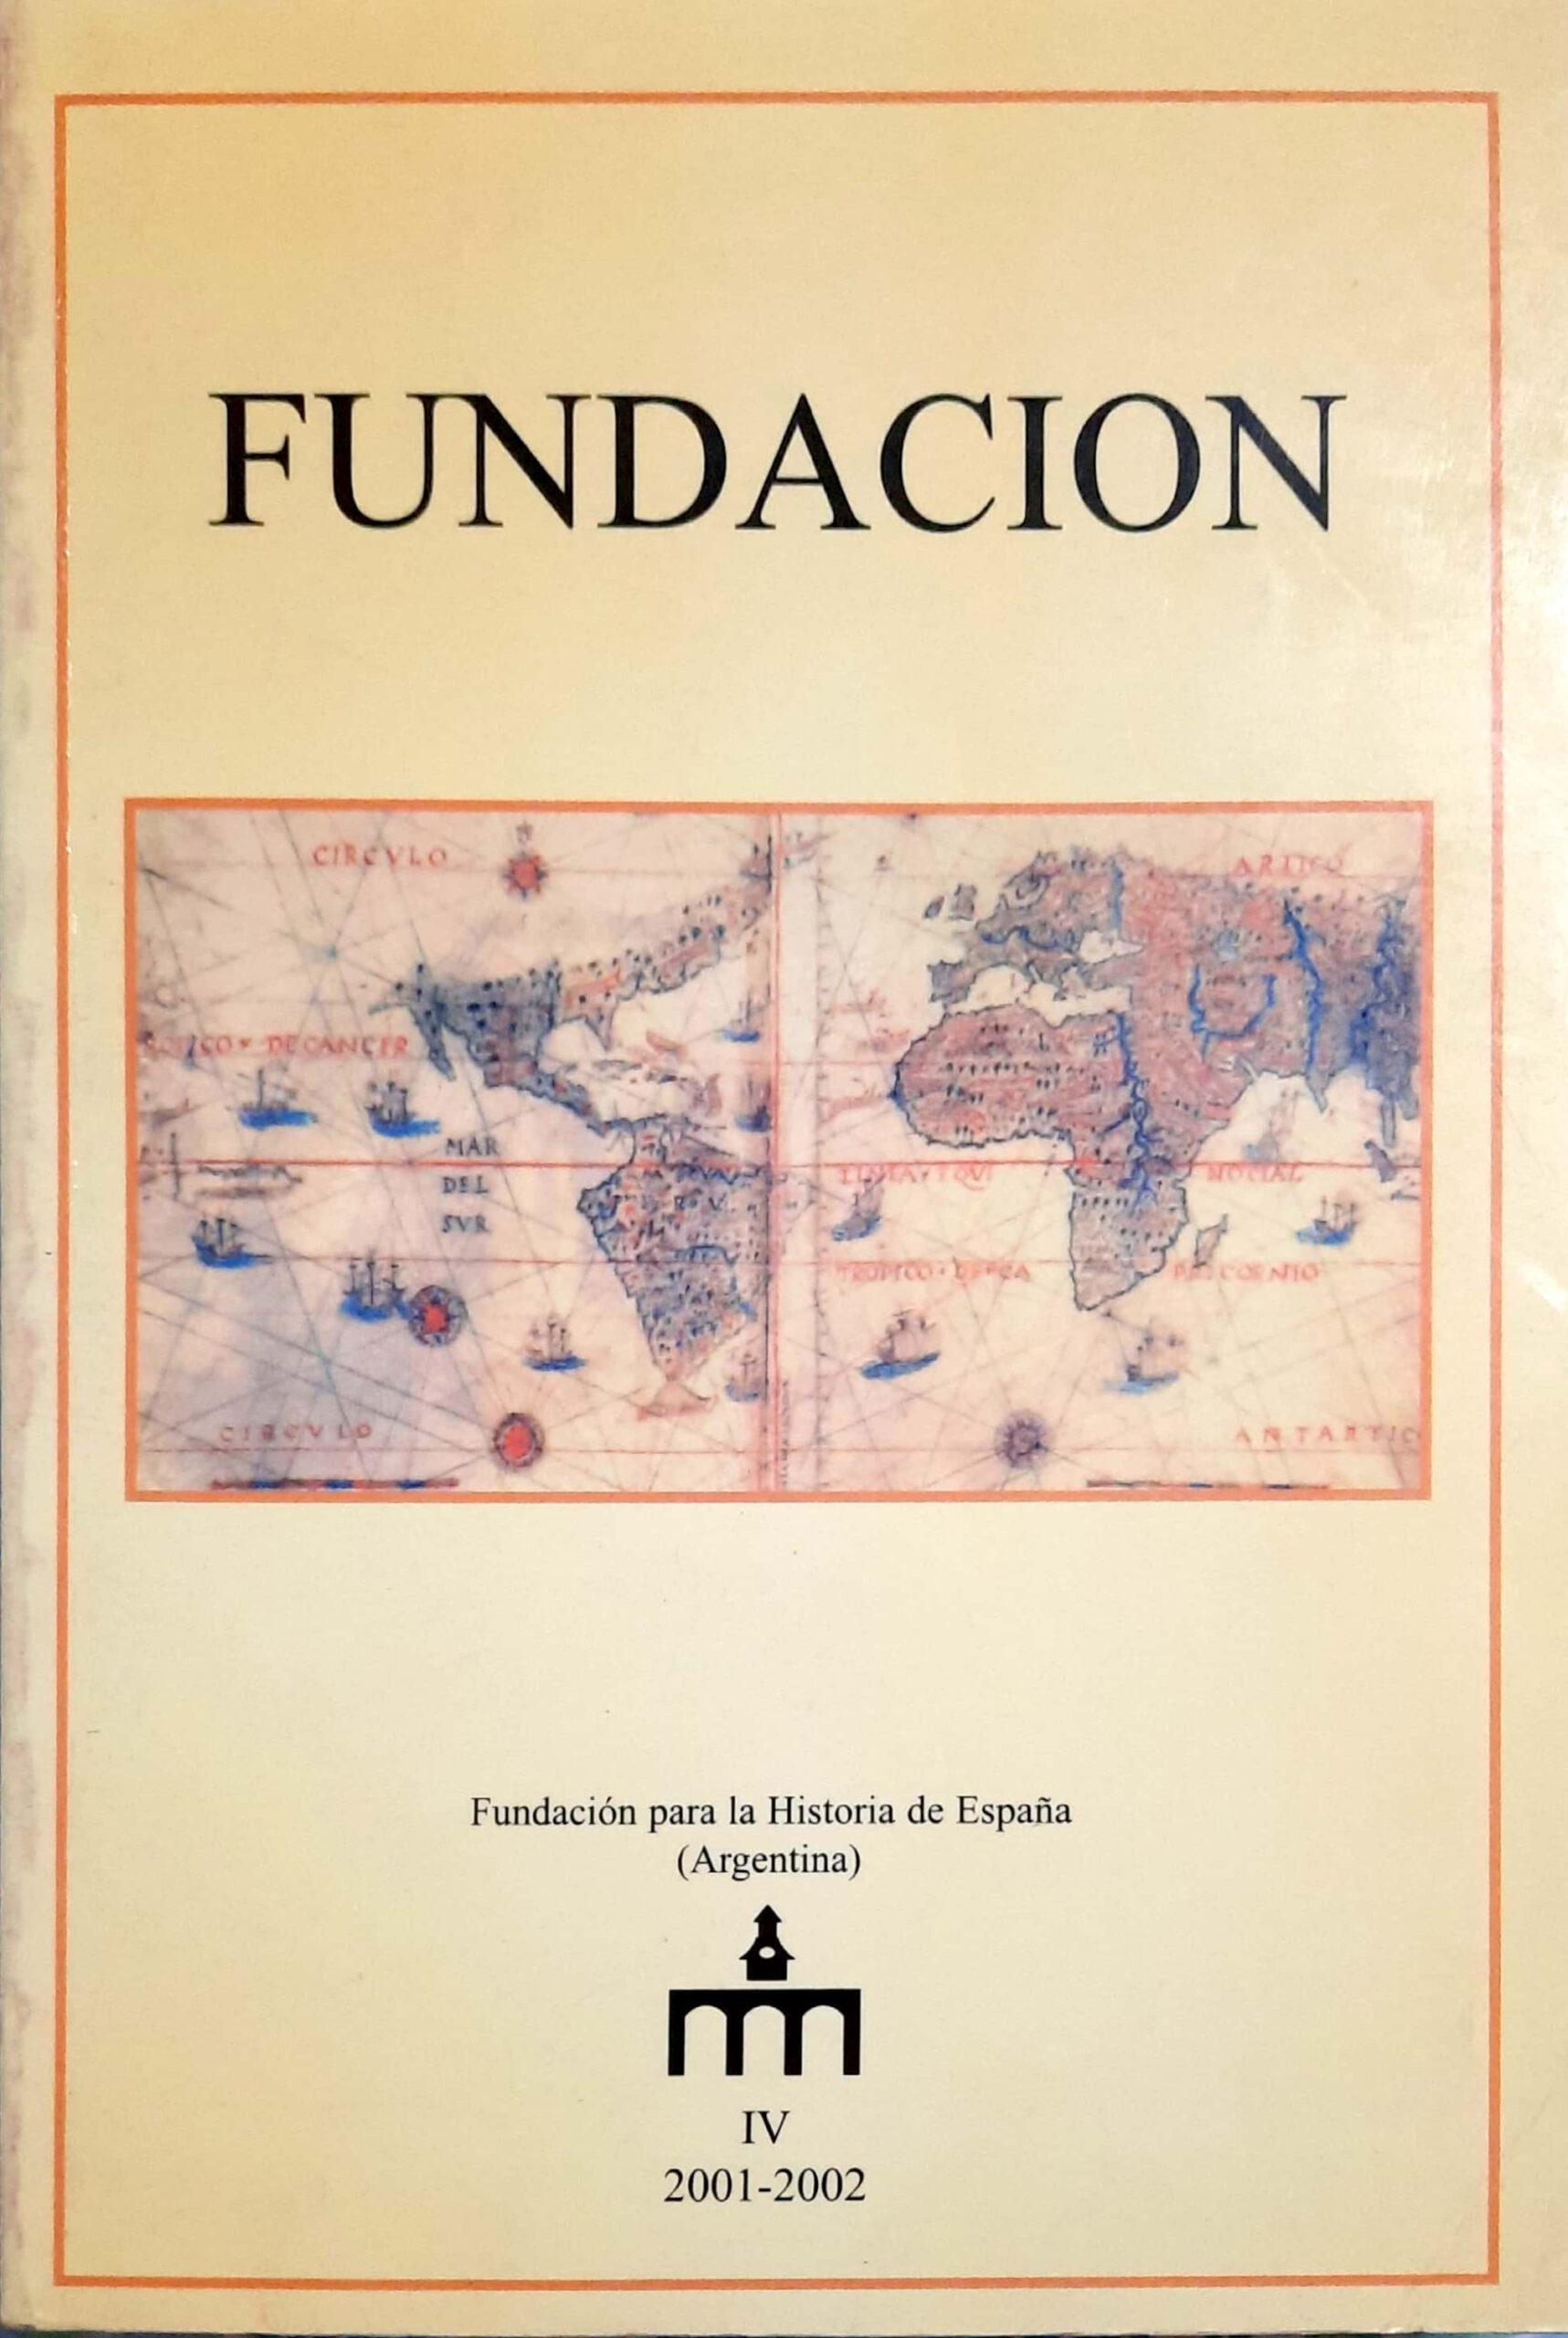 fundaciones-IV